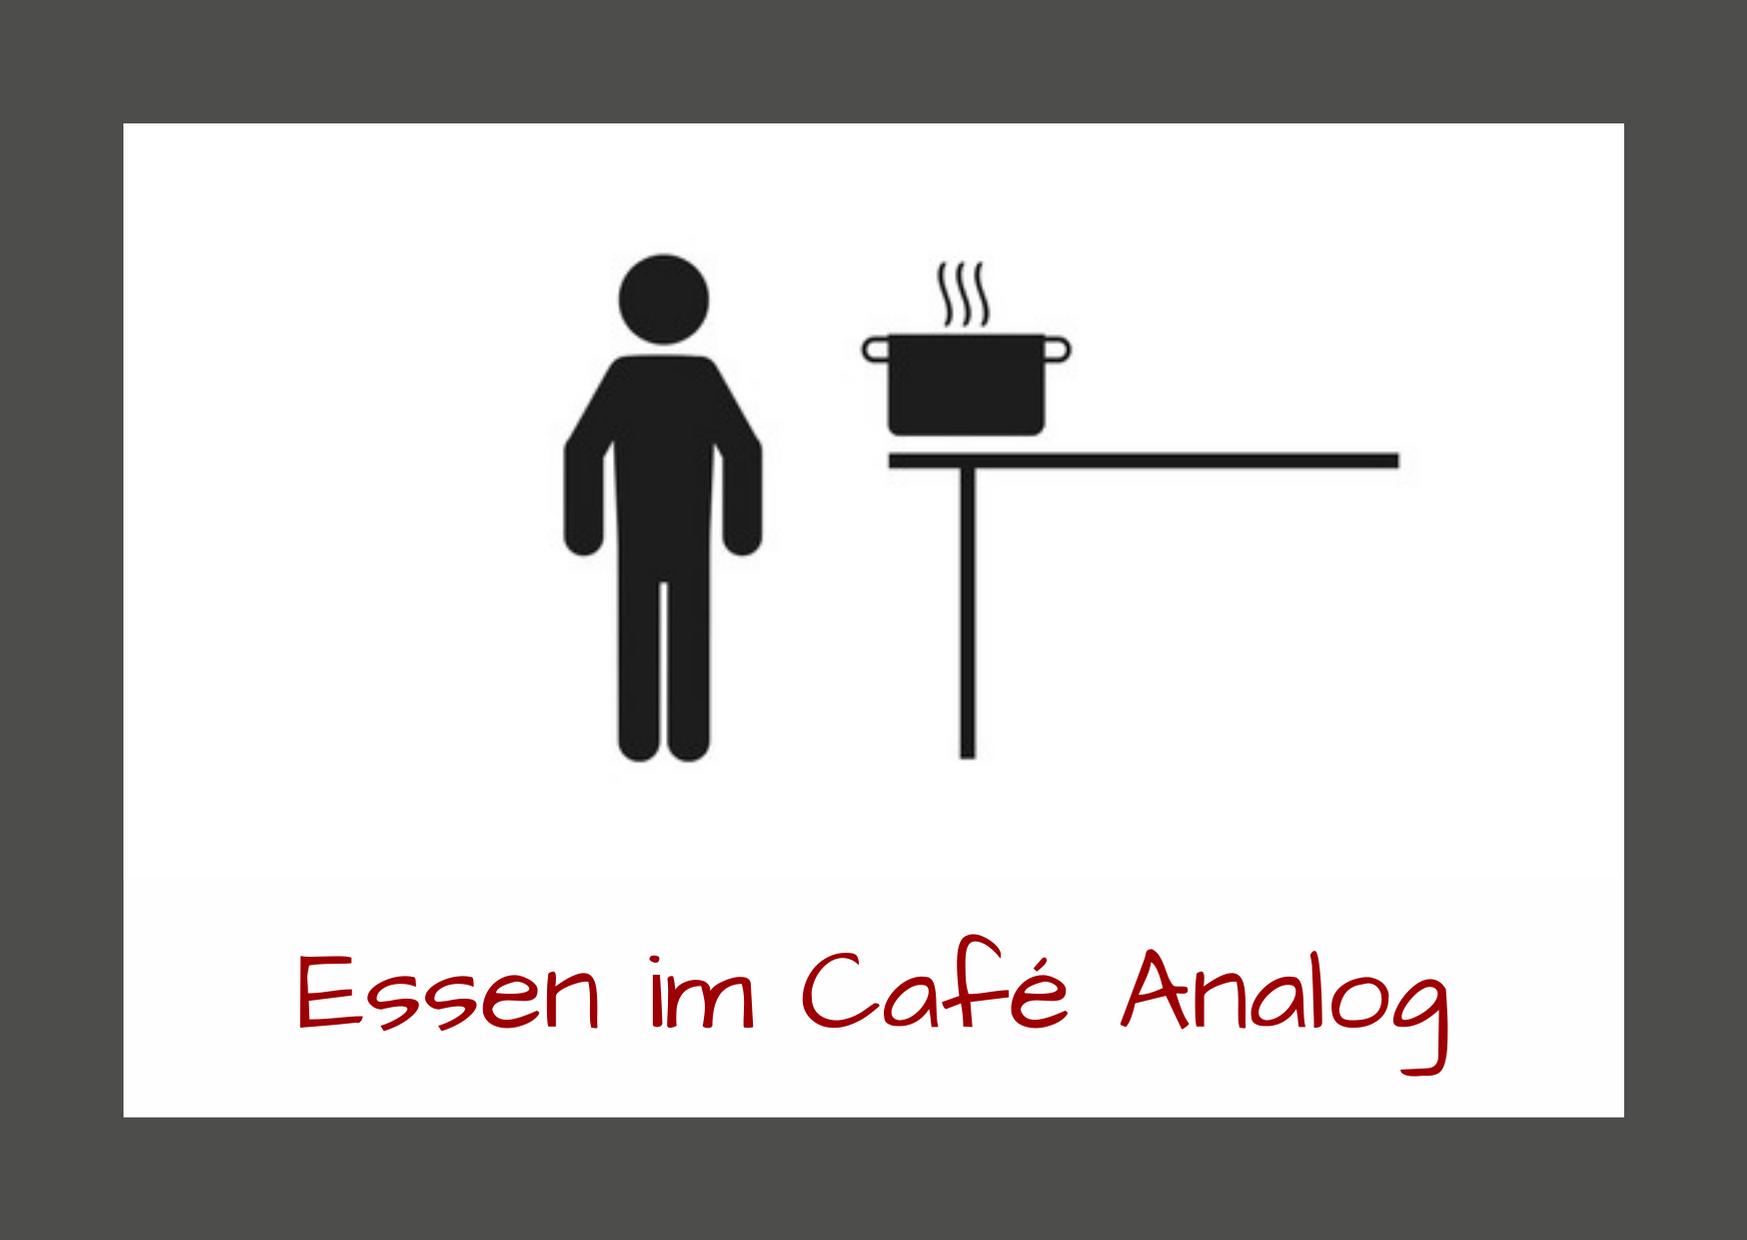 Essen im Café Analog - Corona-Sicherheitsmaßnahmen